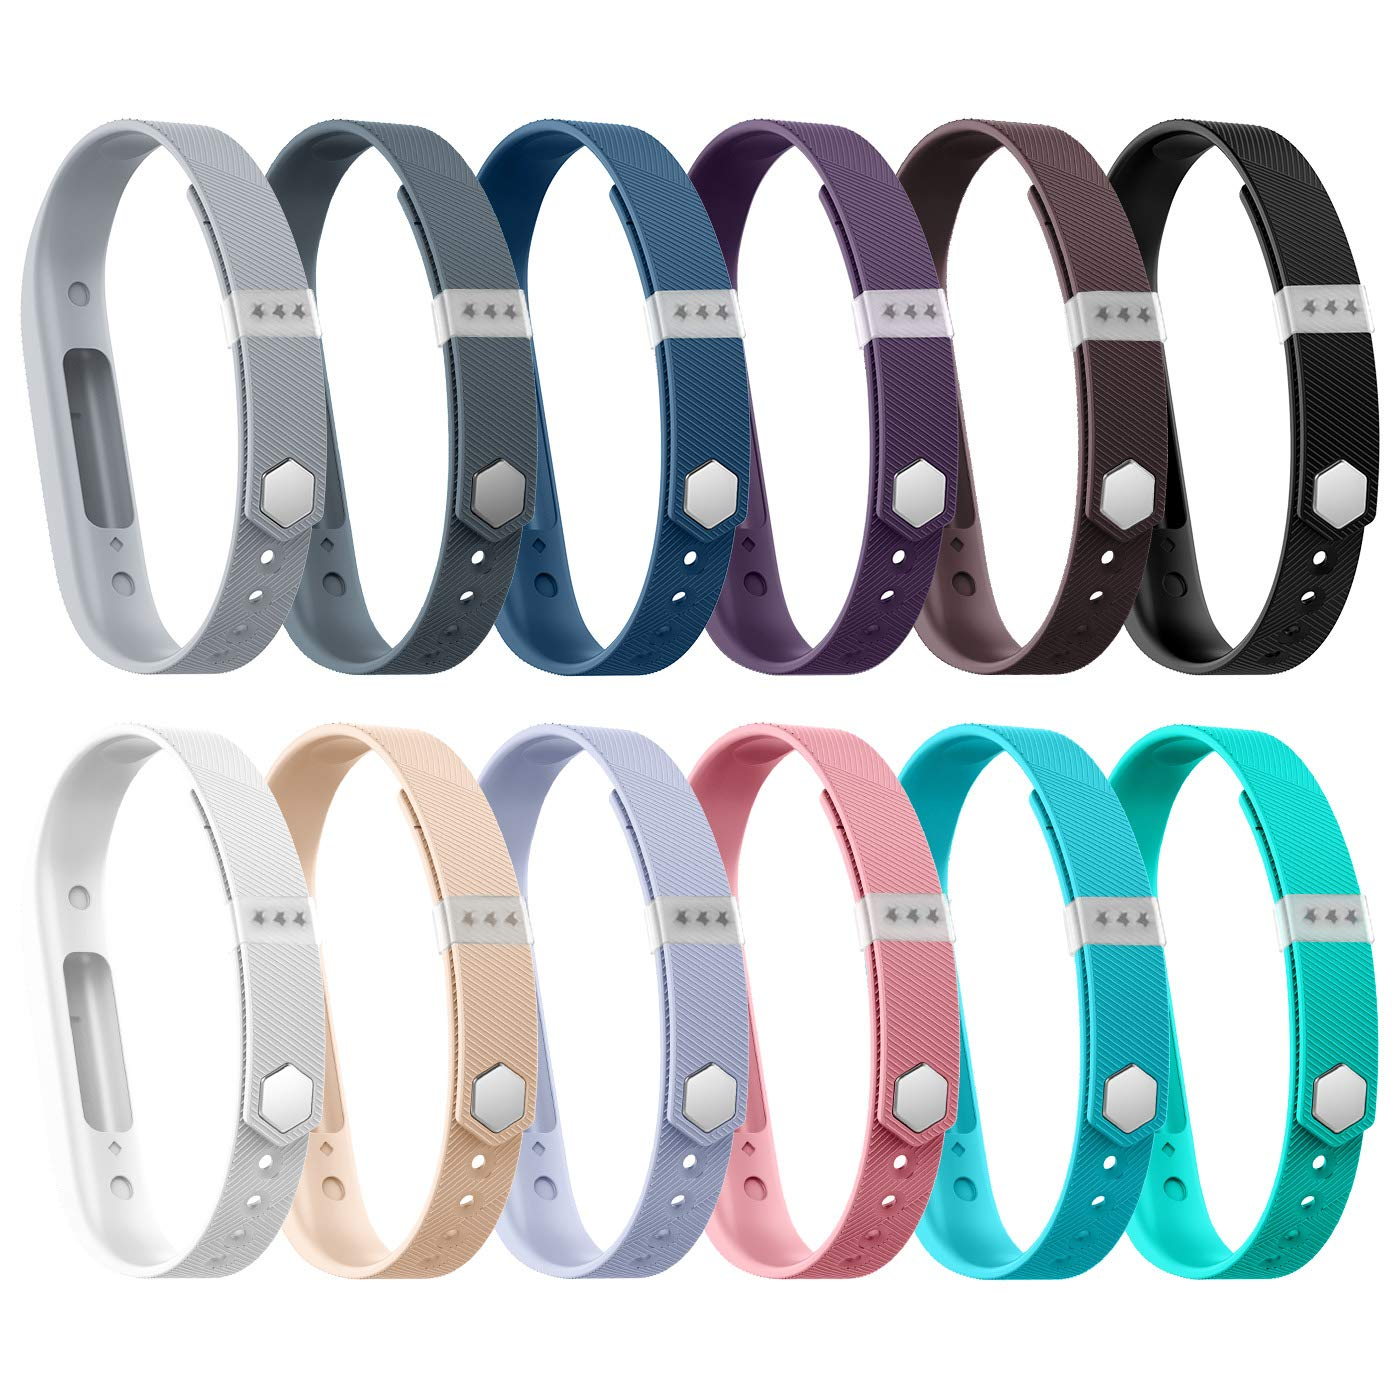 BeneStellar 12 Colors Fitbit Flex 2 Band Bracelet Strap Replacement Band for Fitbit Flex 2